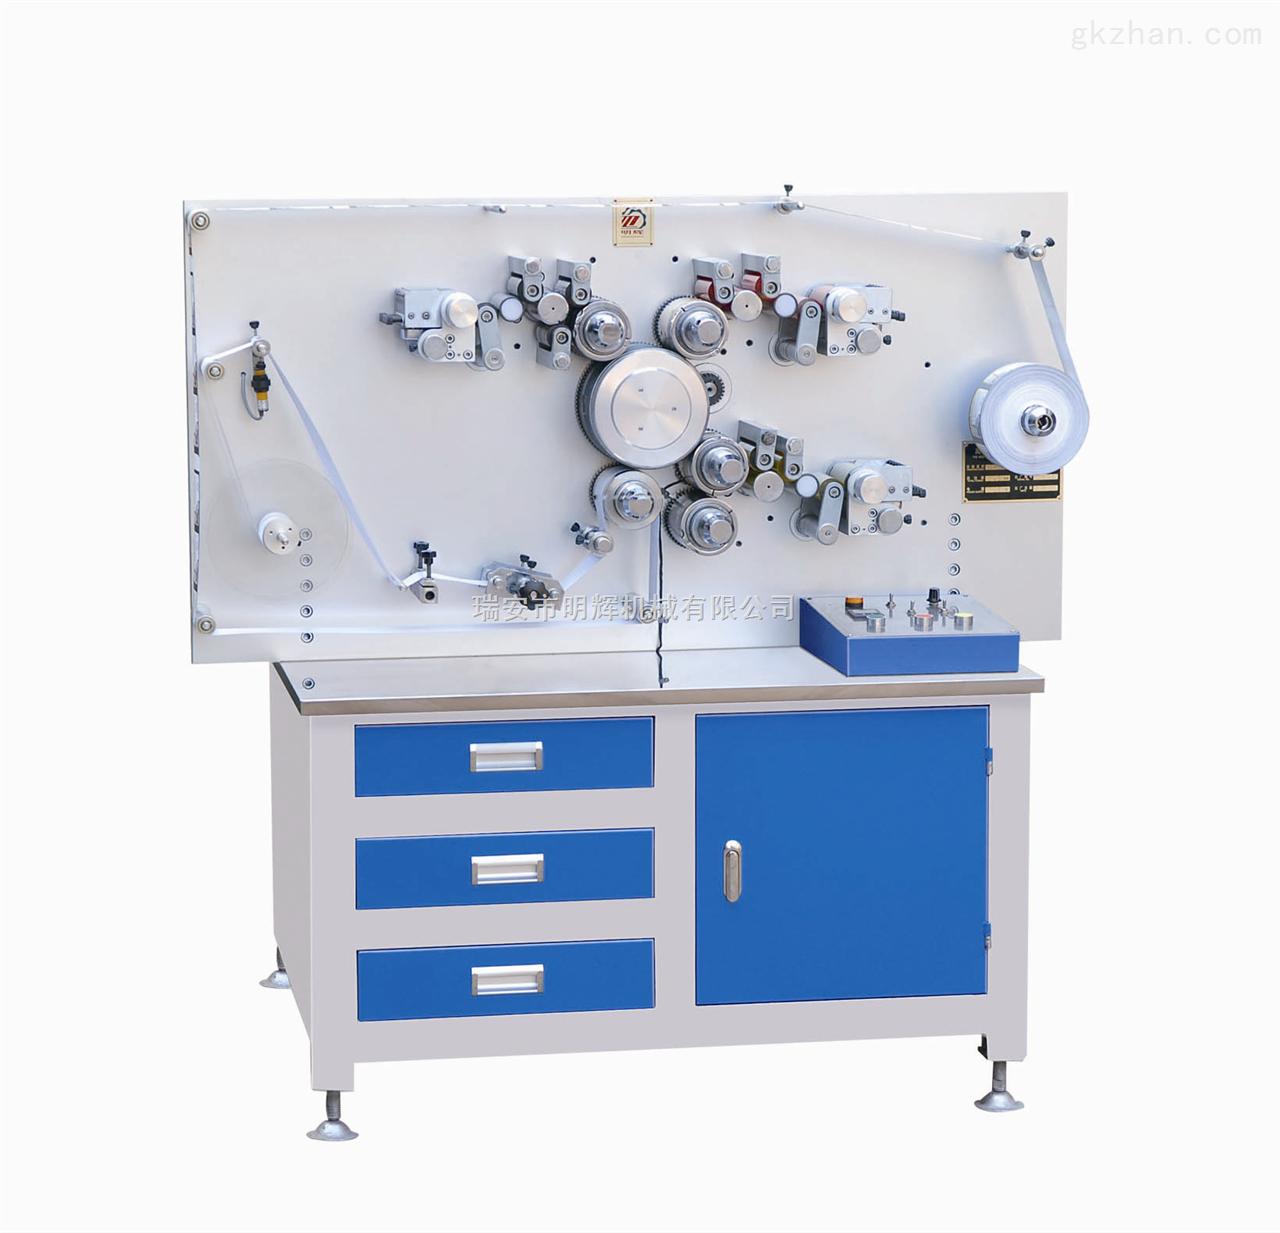 MHL-1003S三色双面高速轮转商标印刷机